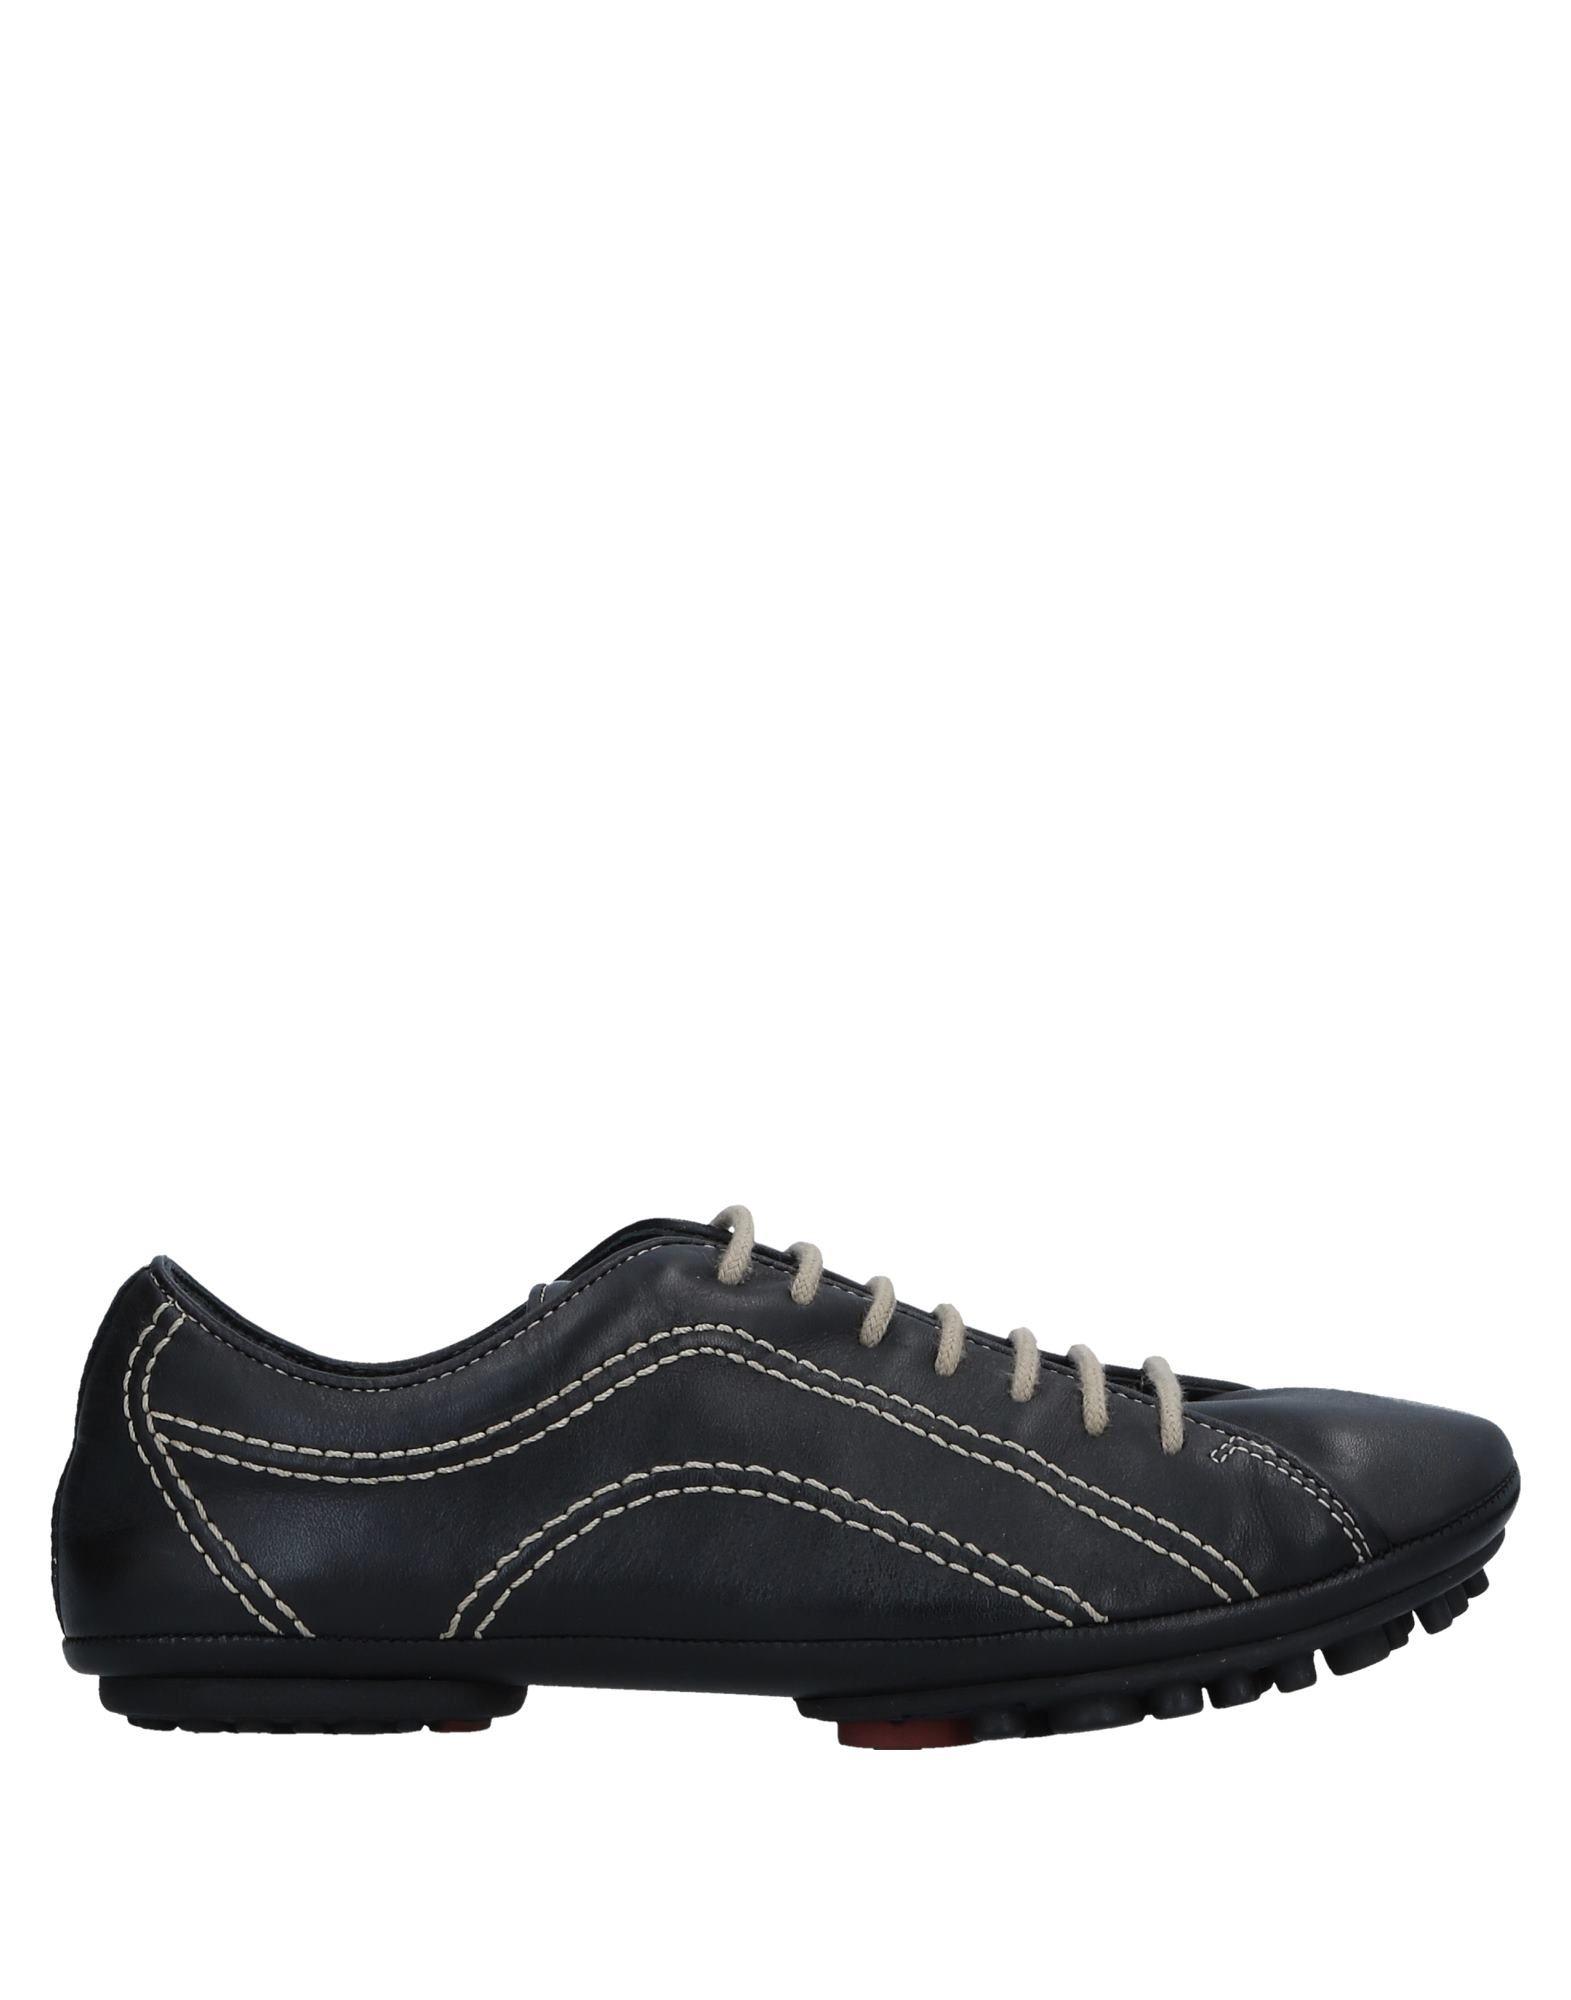 Stilvolle billige Schuhe Camper Sneakers Damen  11520183XG